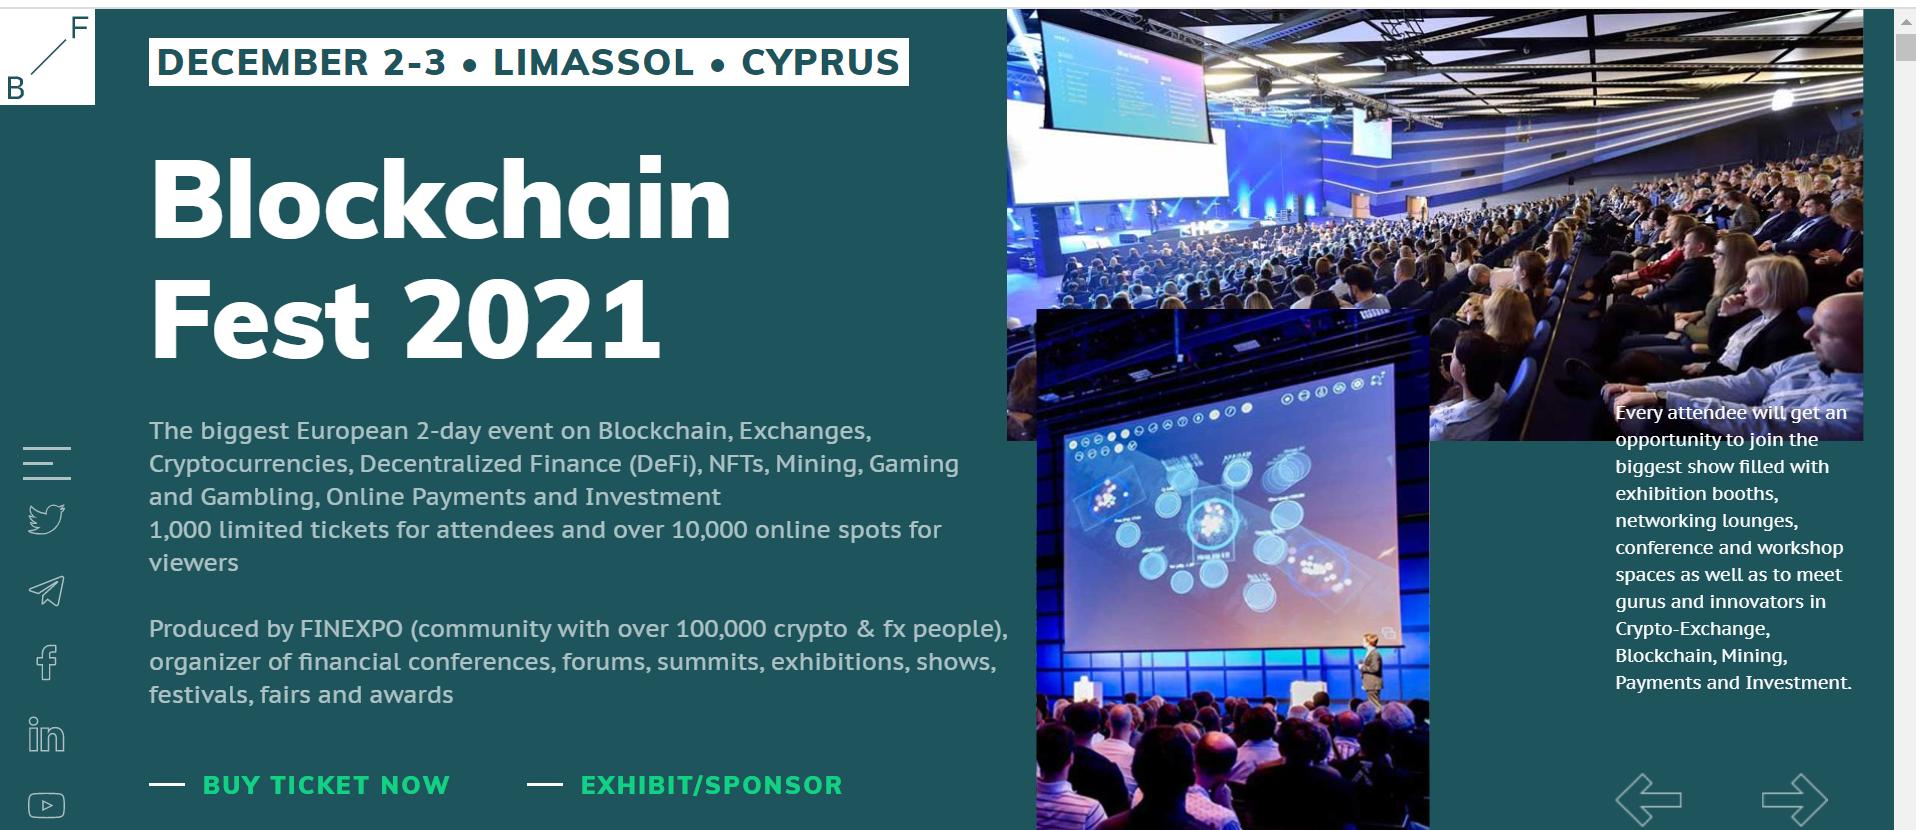 Blockchain Fest 2021